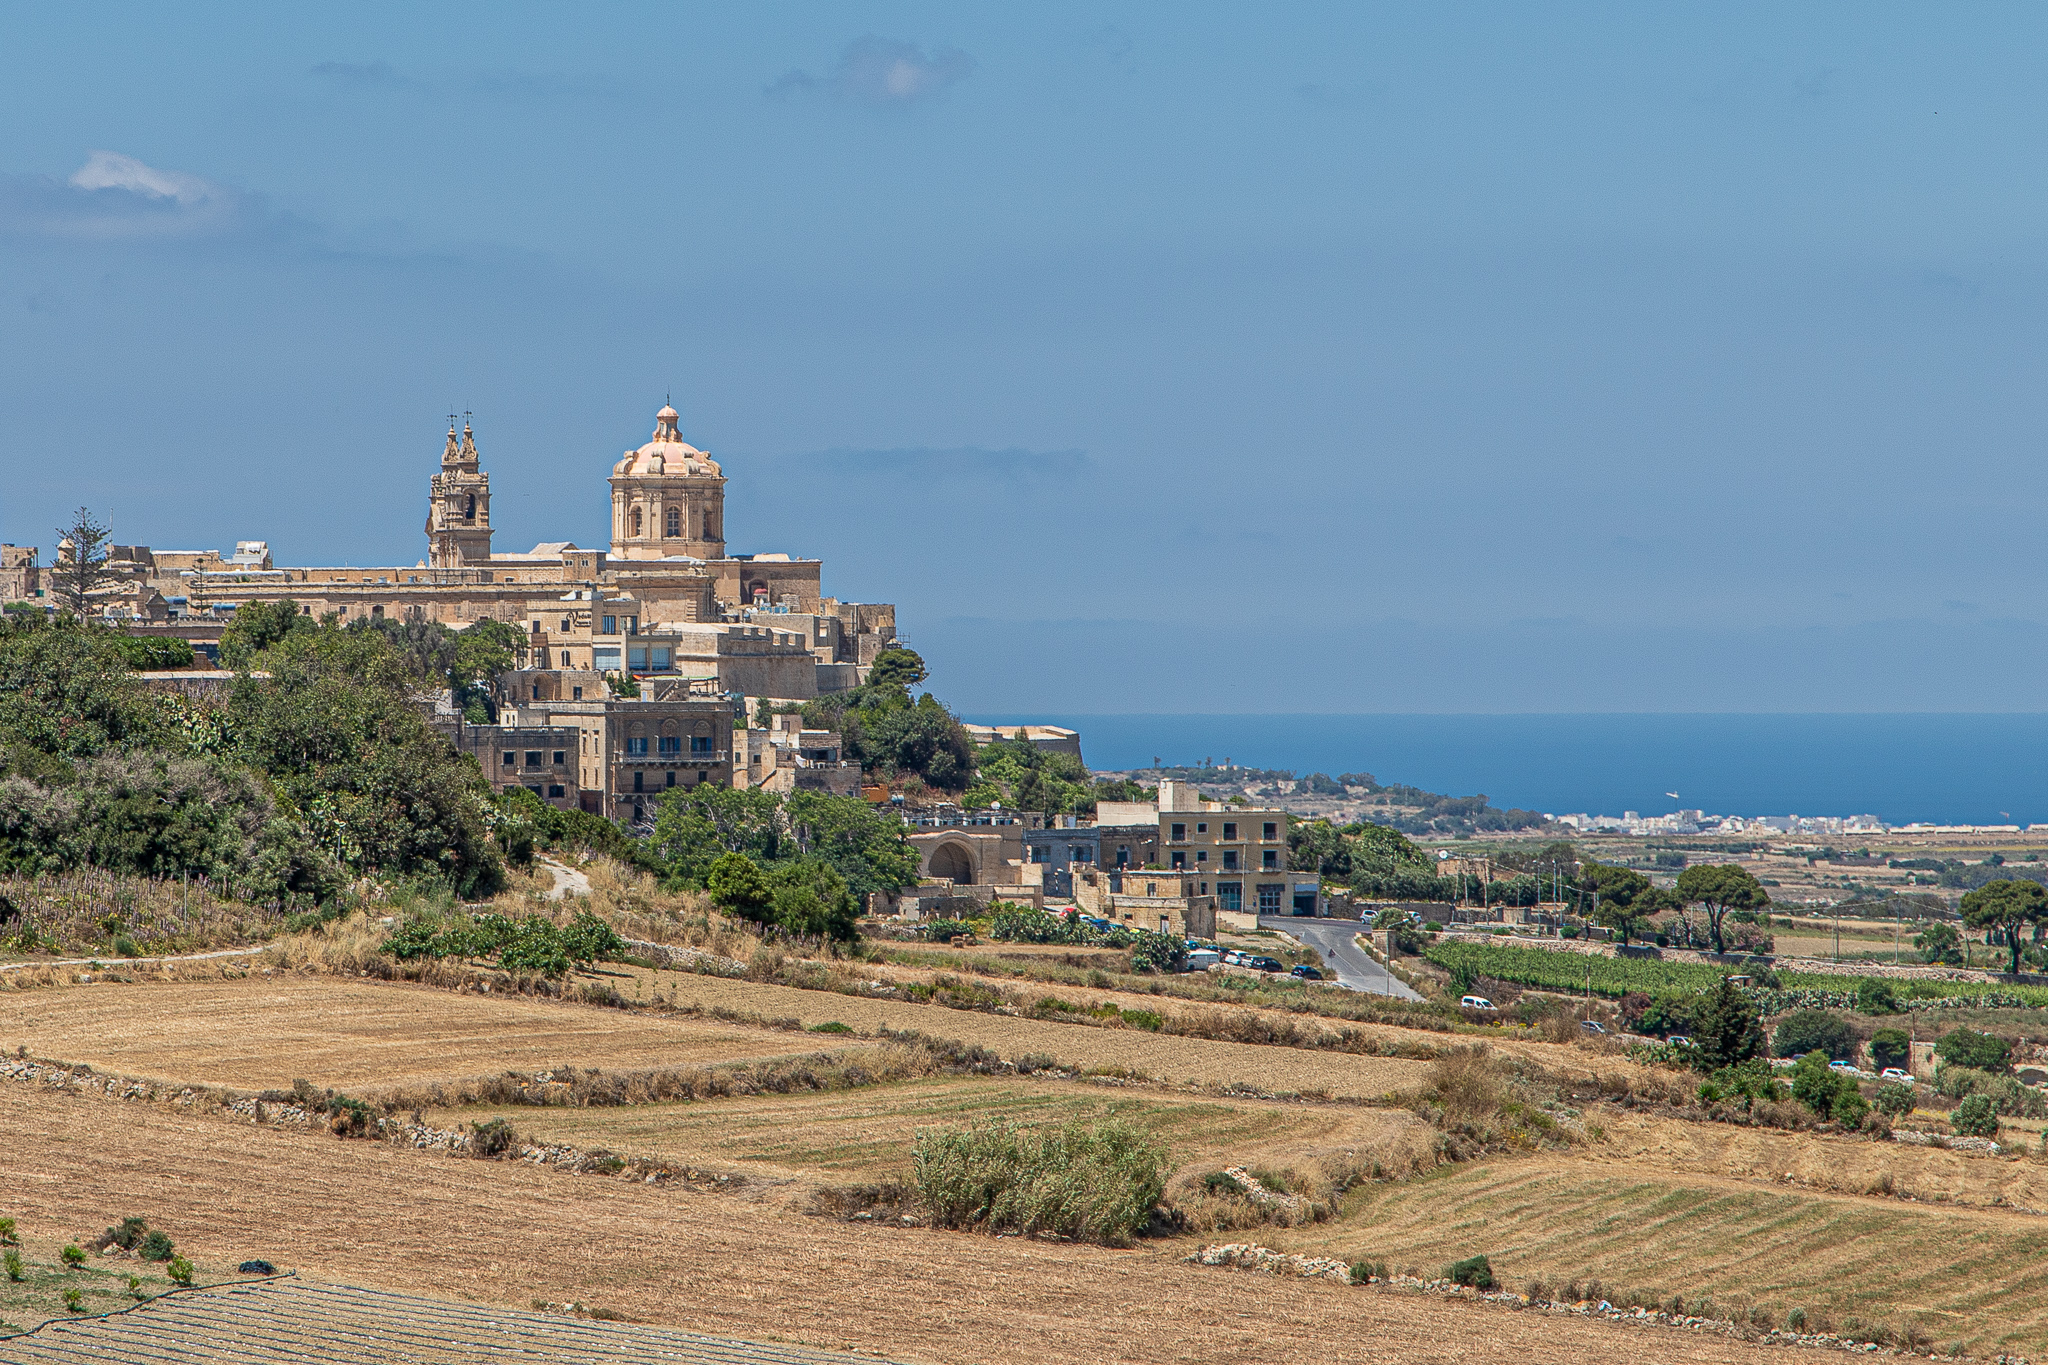 The Silent City of Mdina beckons